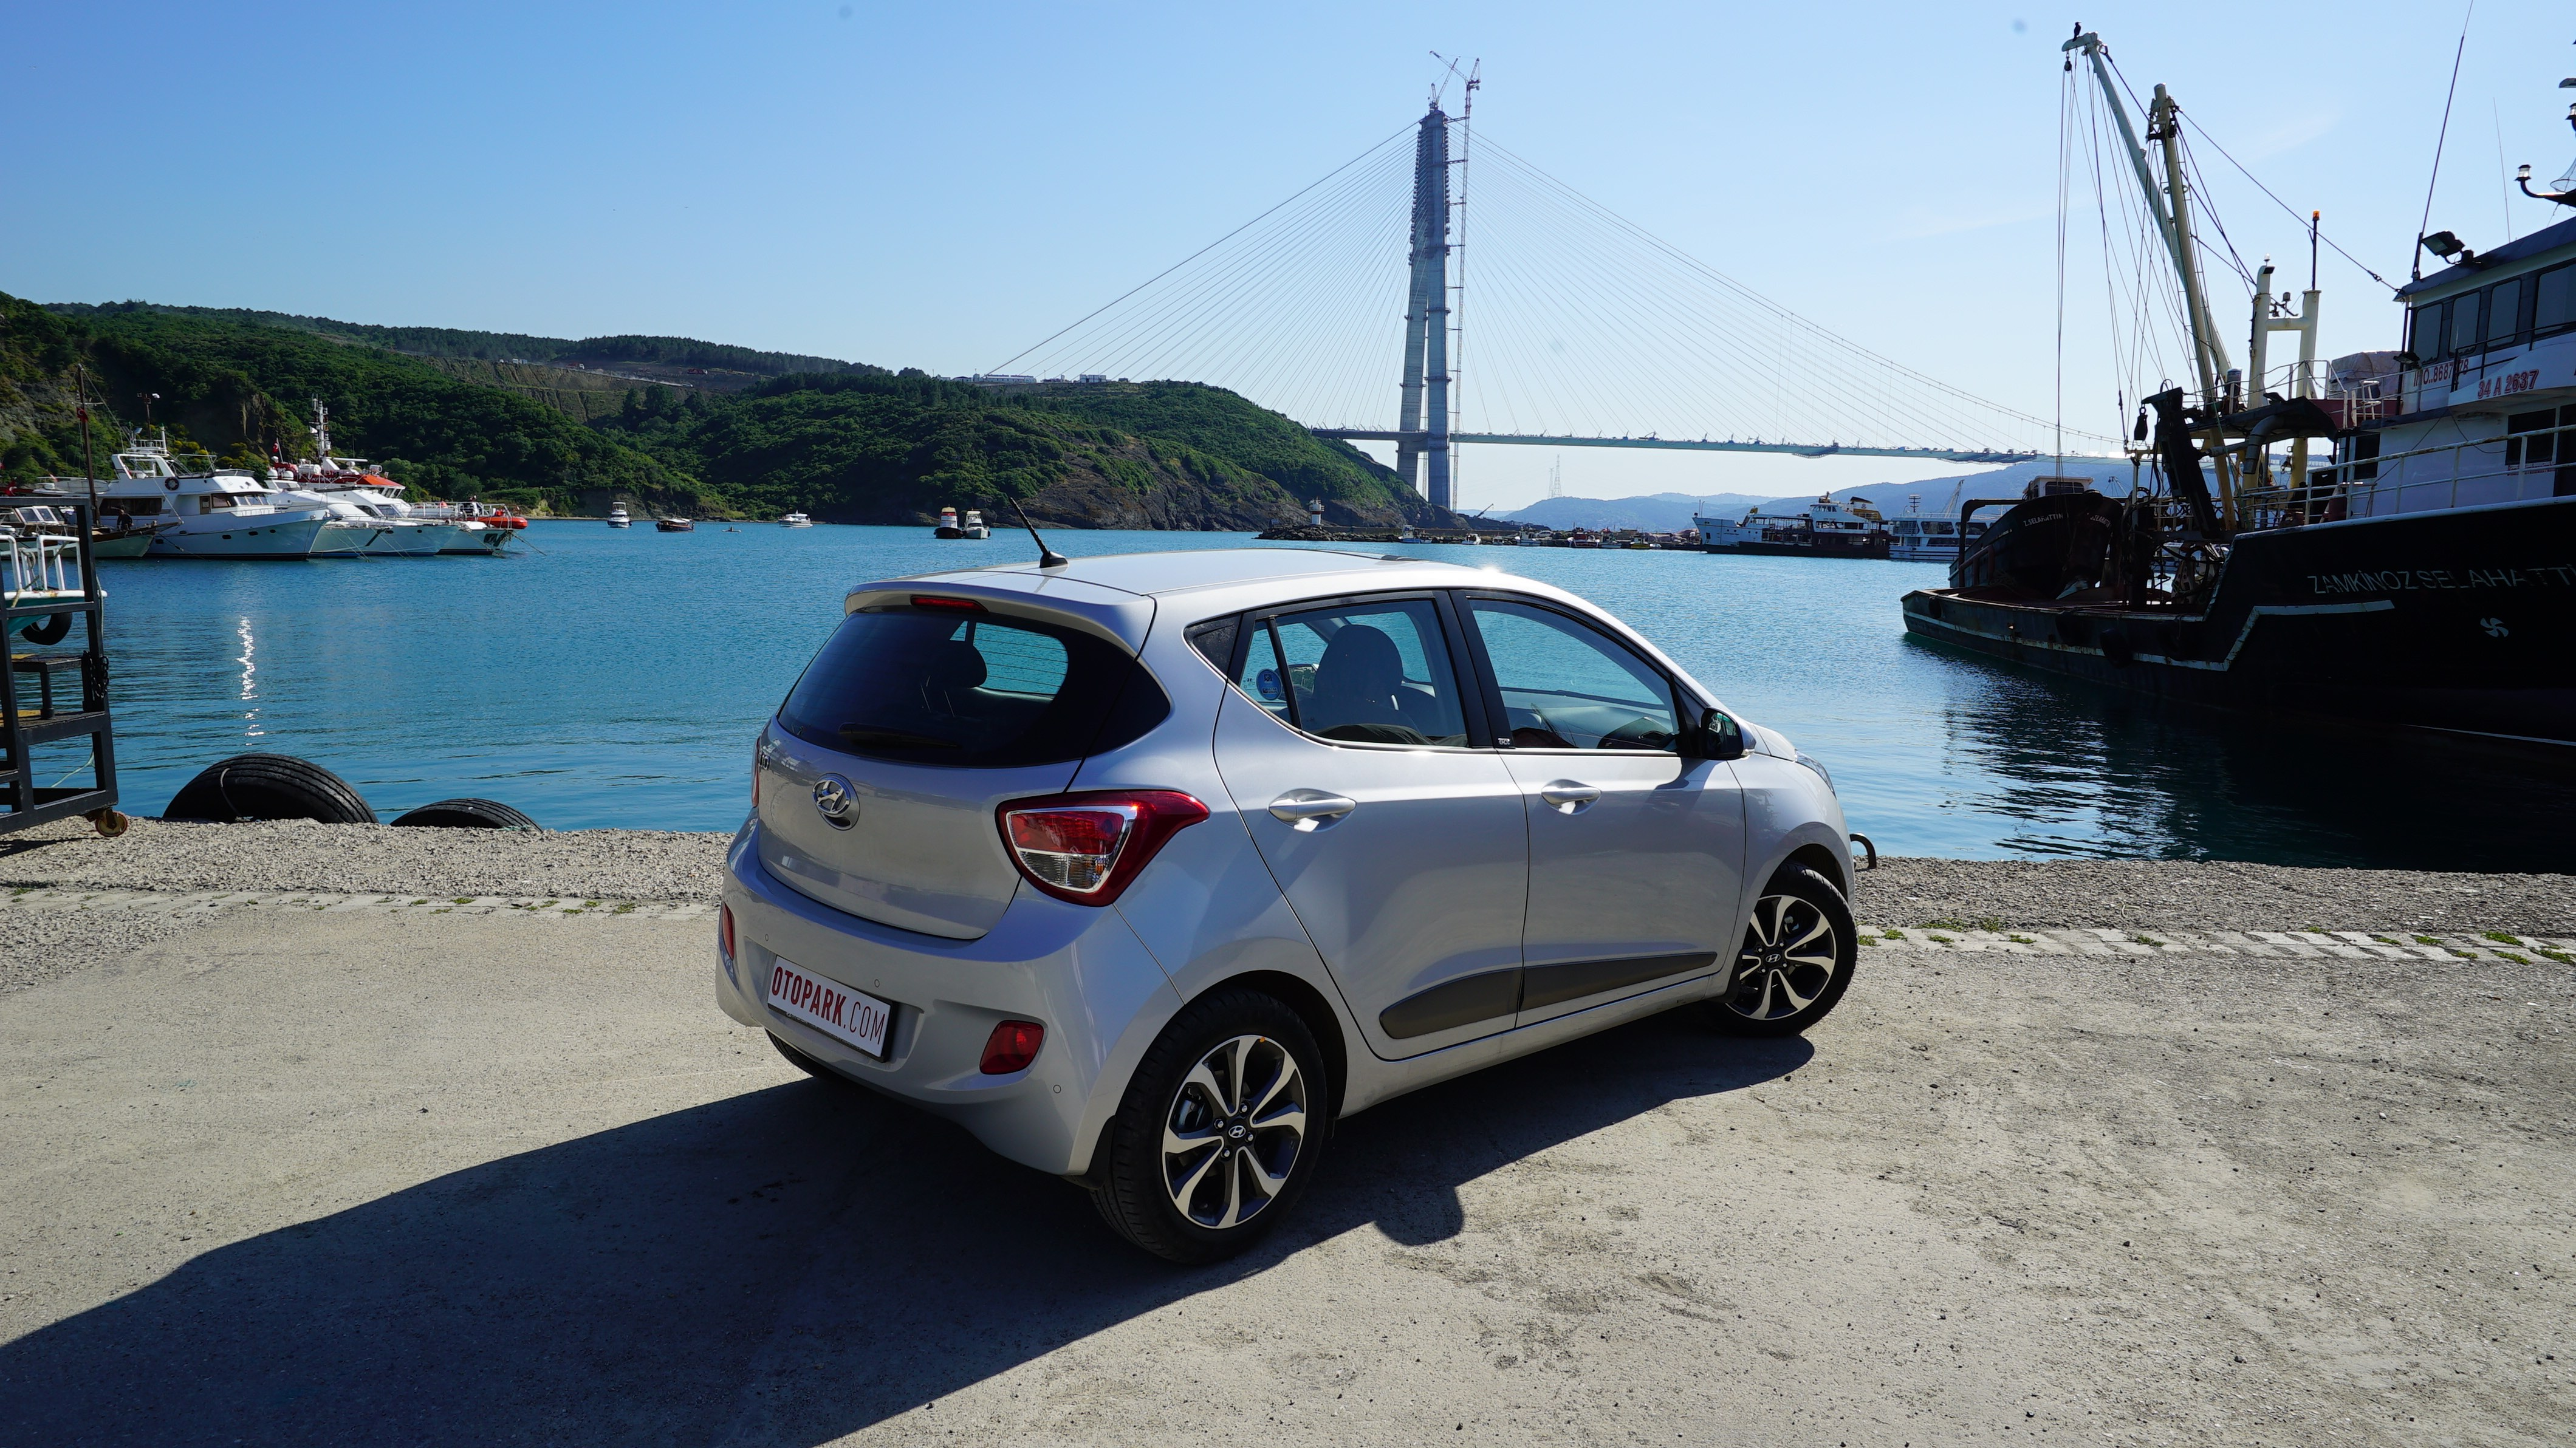 Photo of Guguk Kuşu: Hyundai i10 GO! Edition